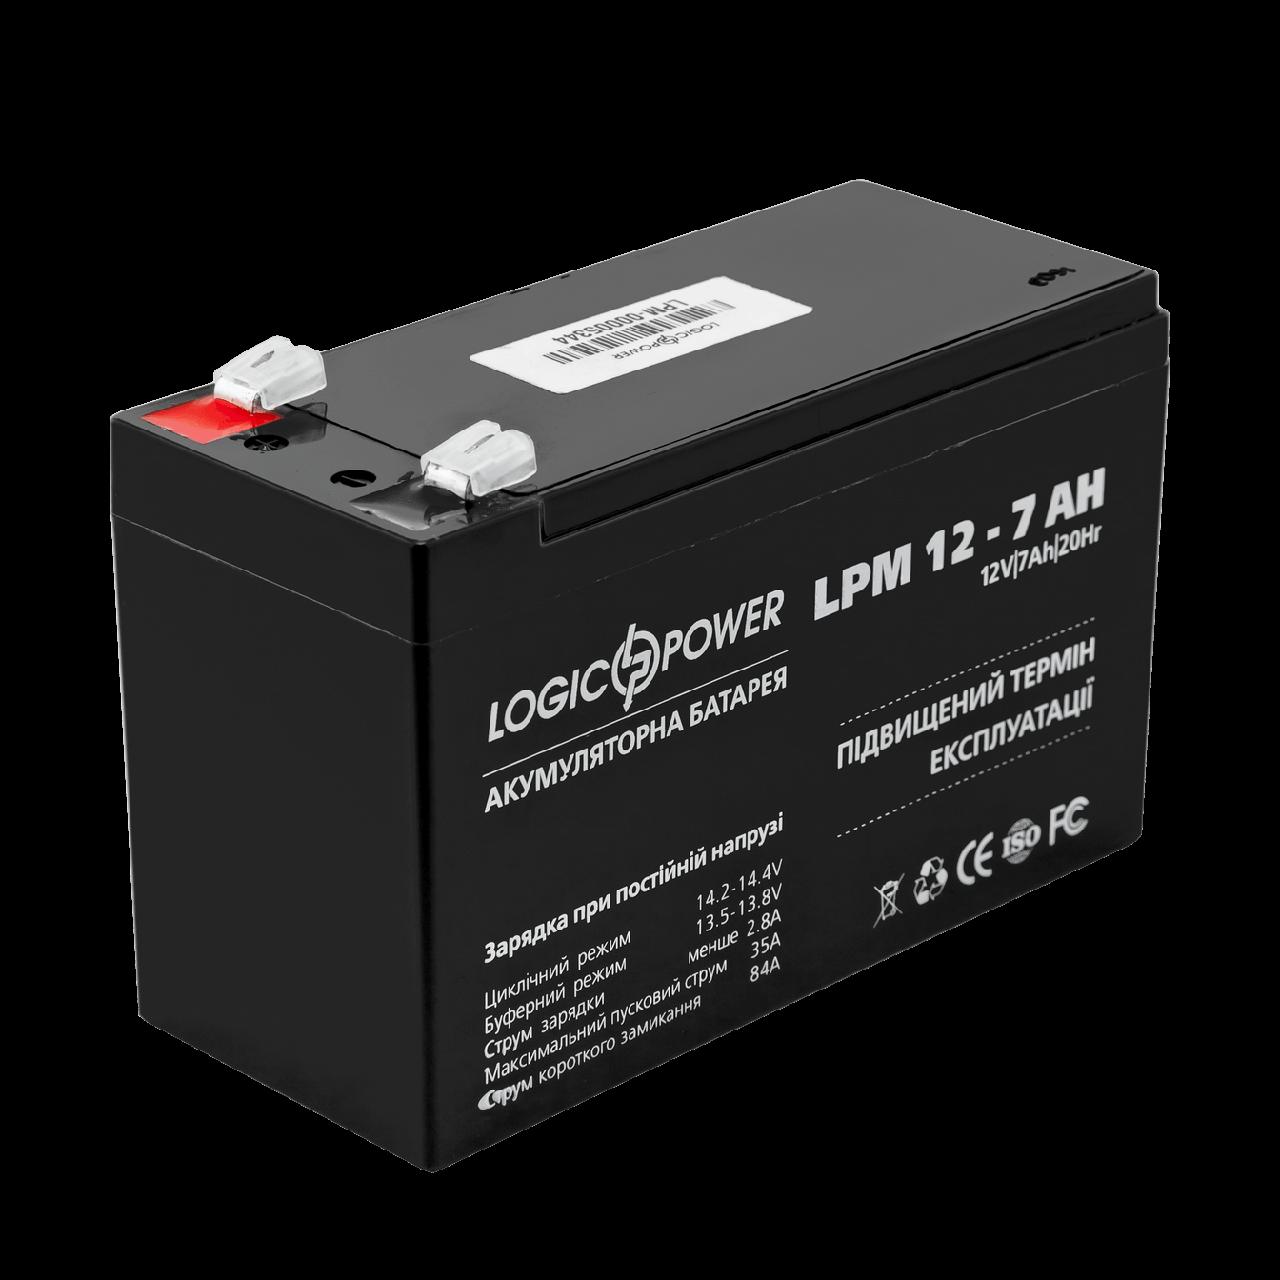 Аккумулятор LPM 12 - 7,0 AH